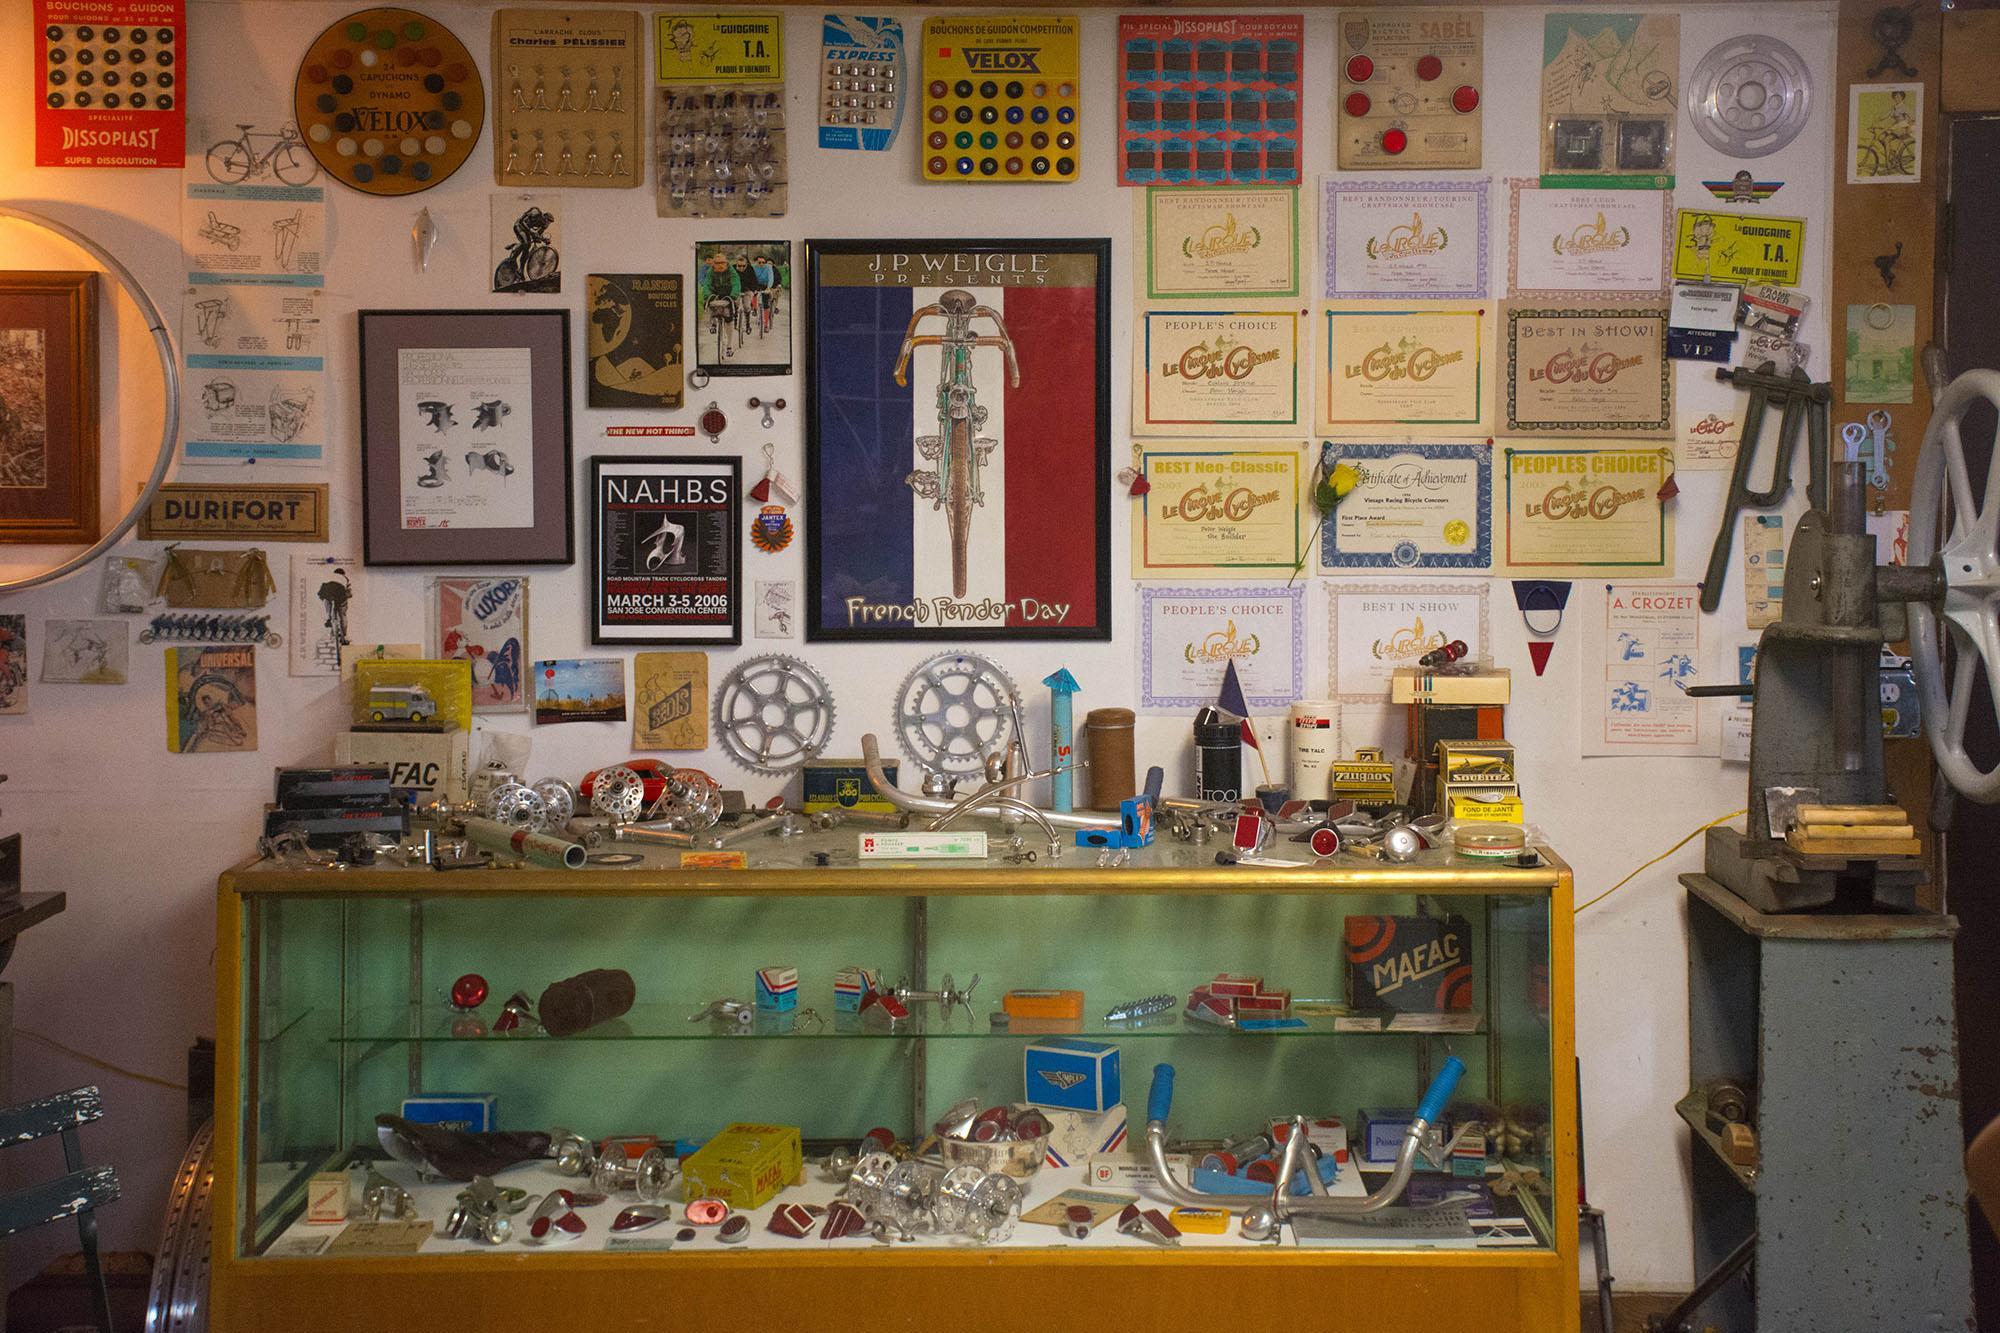 J P Weigle's shop!